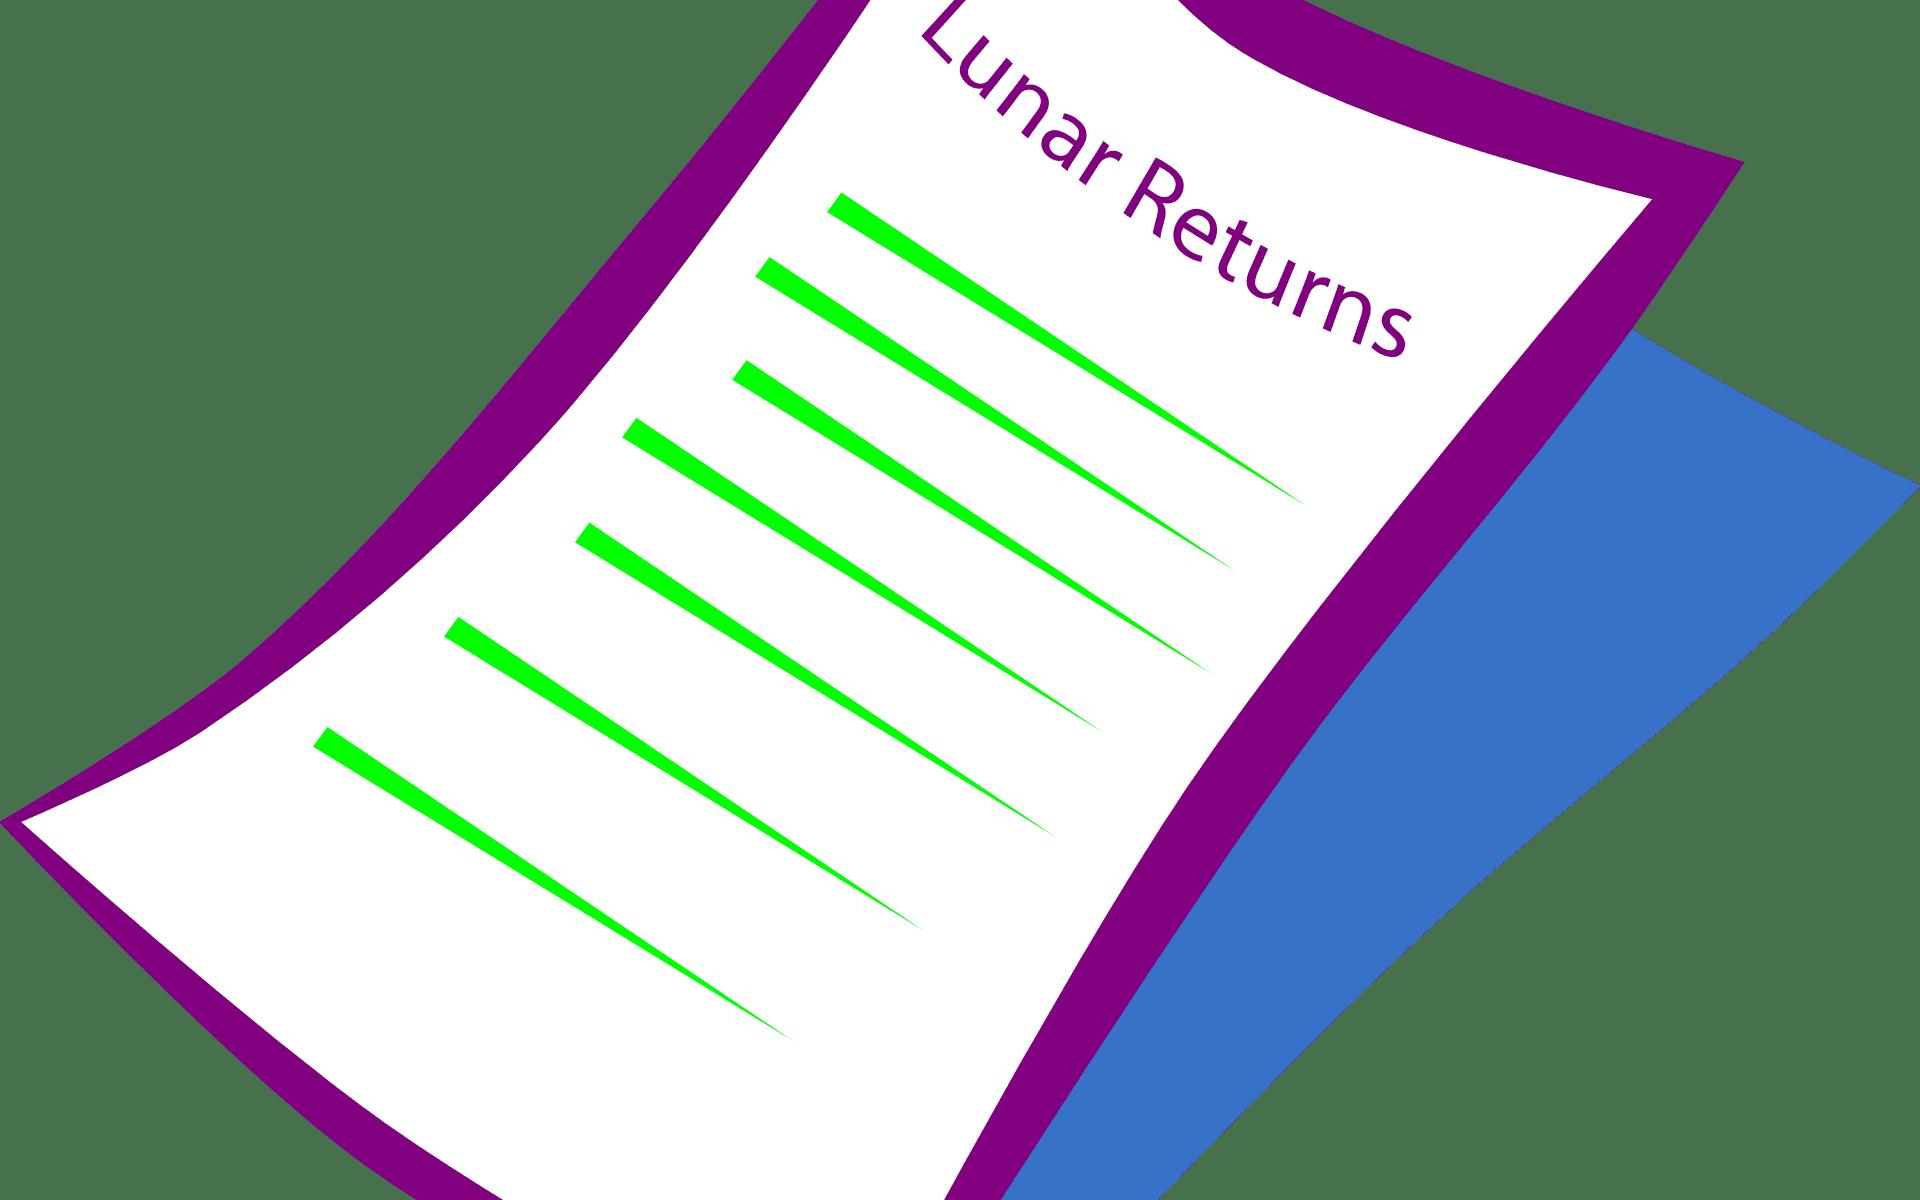 Lunar Returns Report